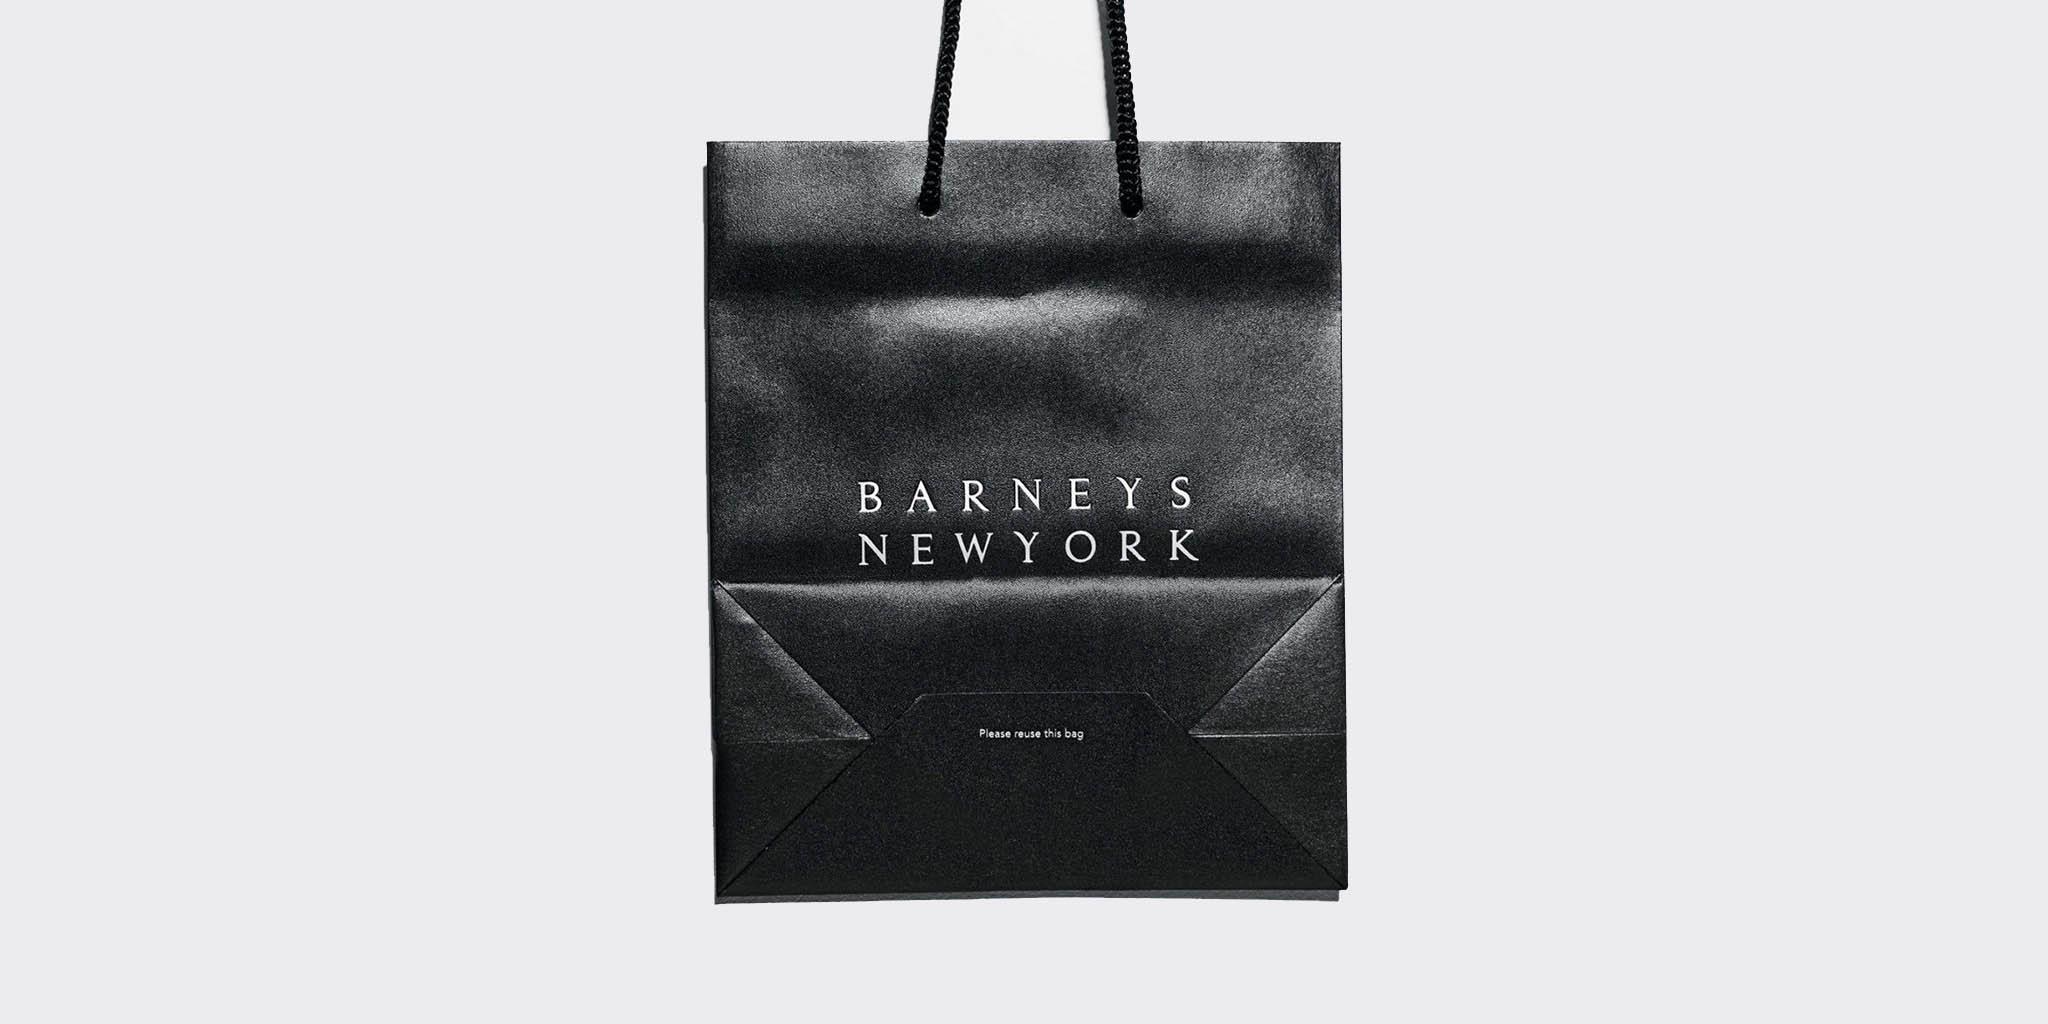 image: Barneys